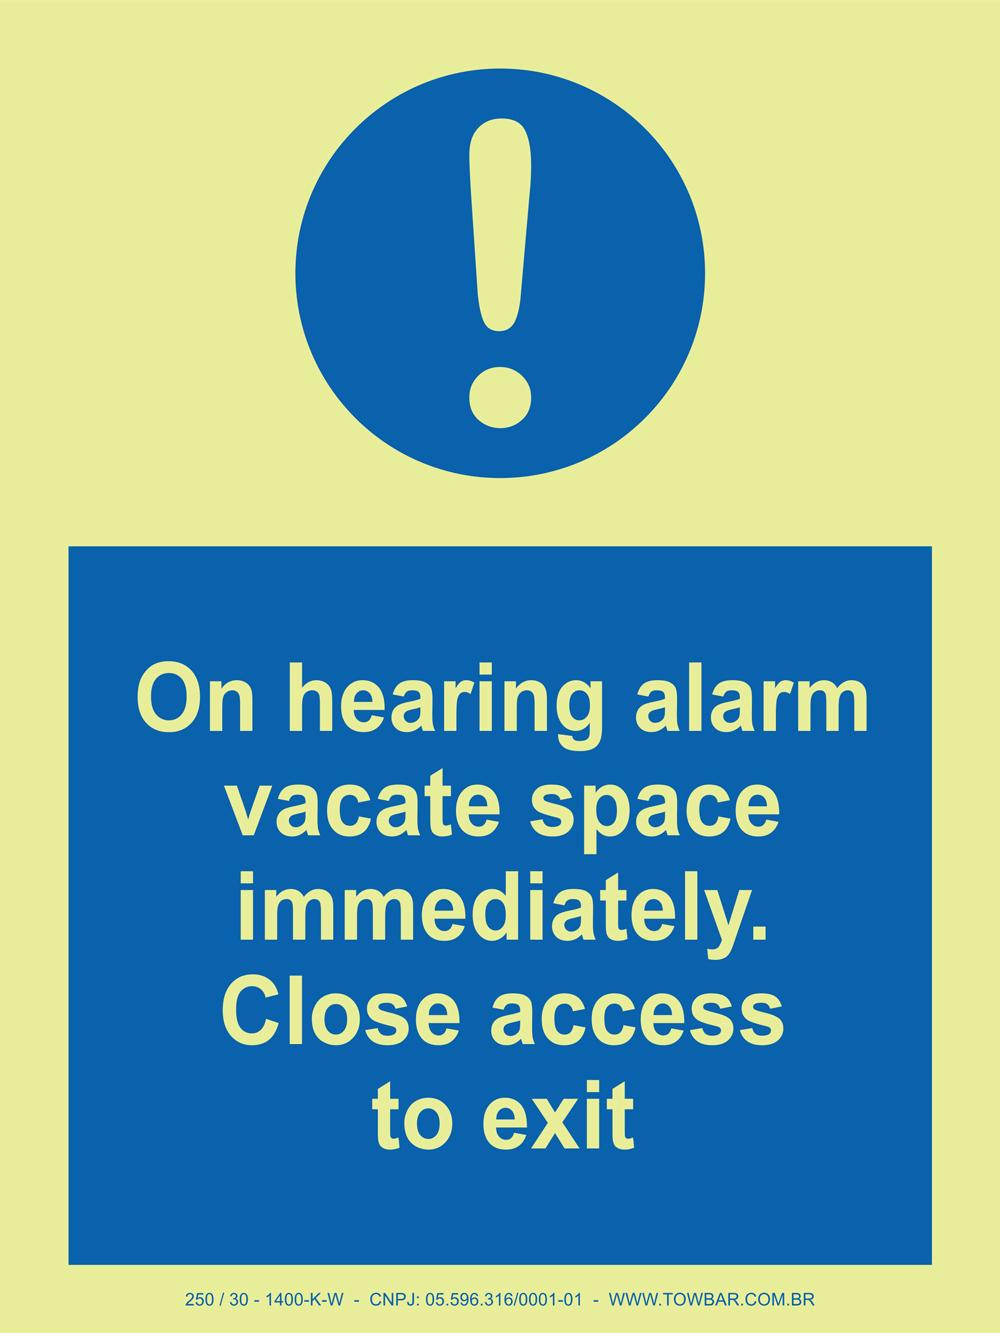 On hearing alarm vacate space immediately. Close access to exit  - Towbar Sinalização de Segurança